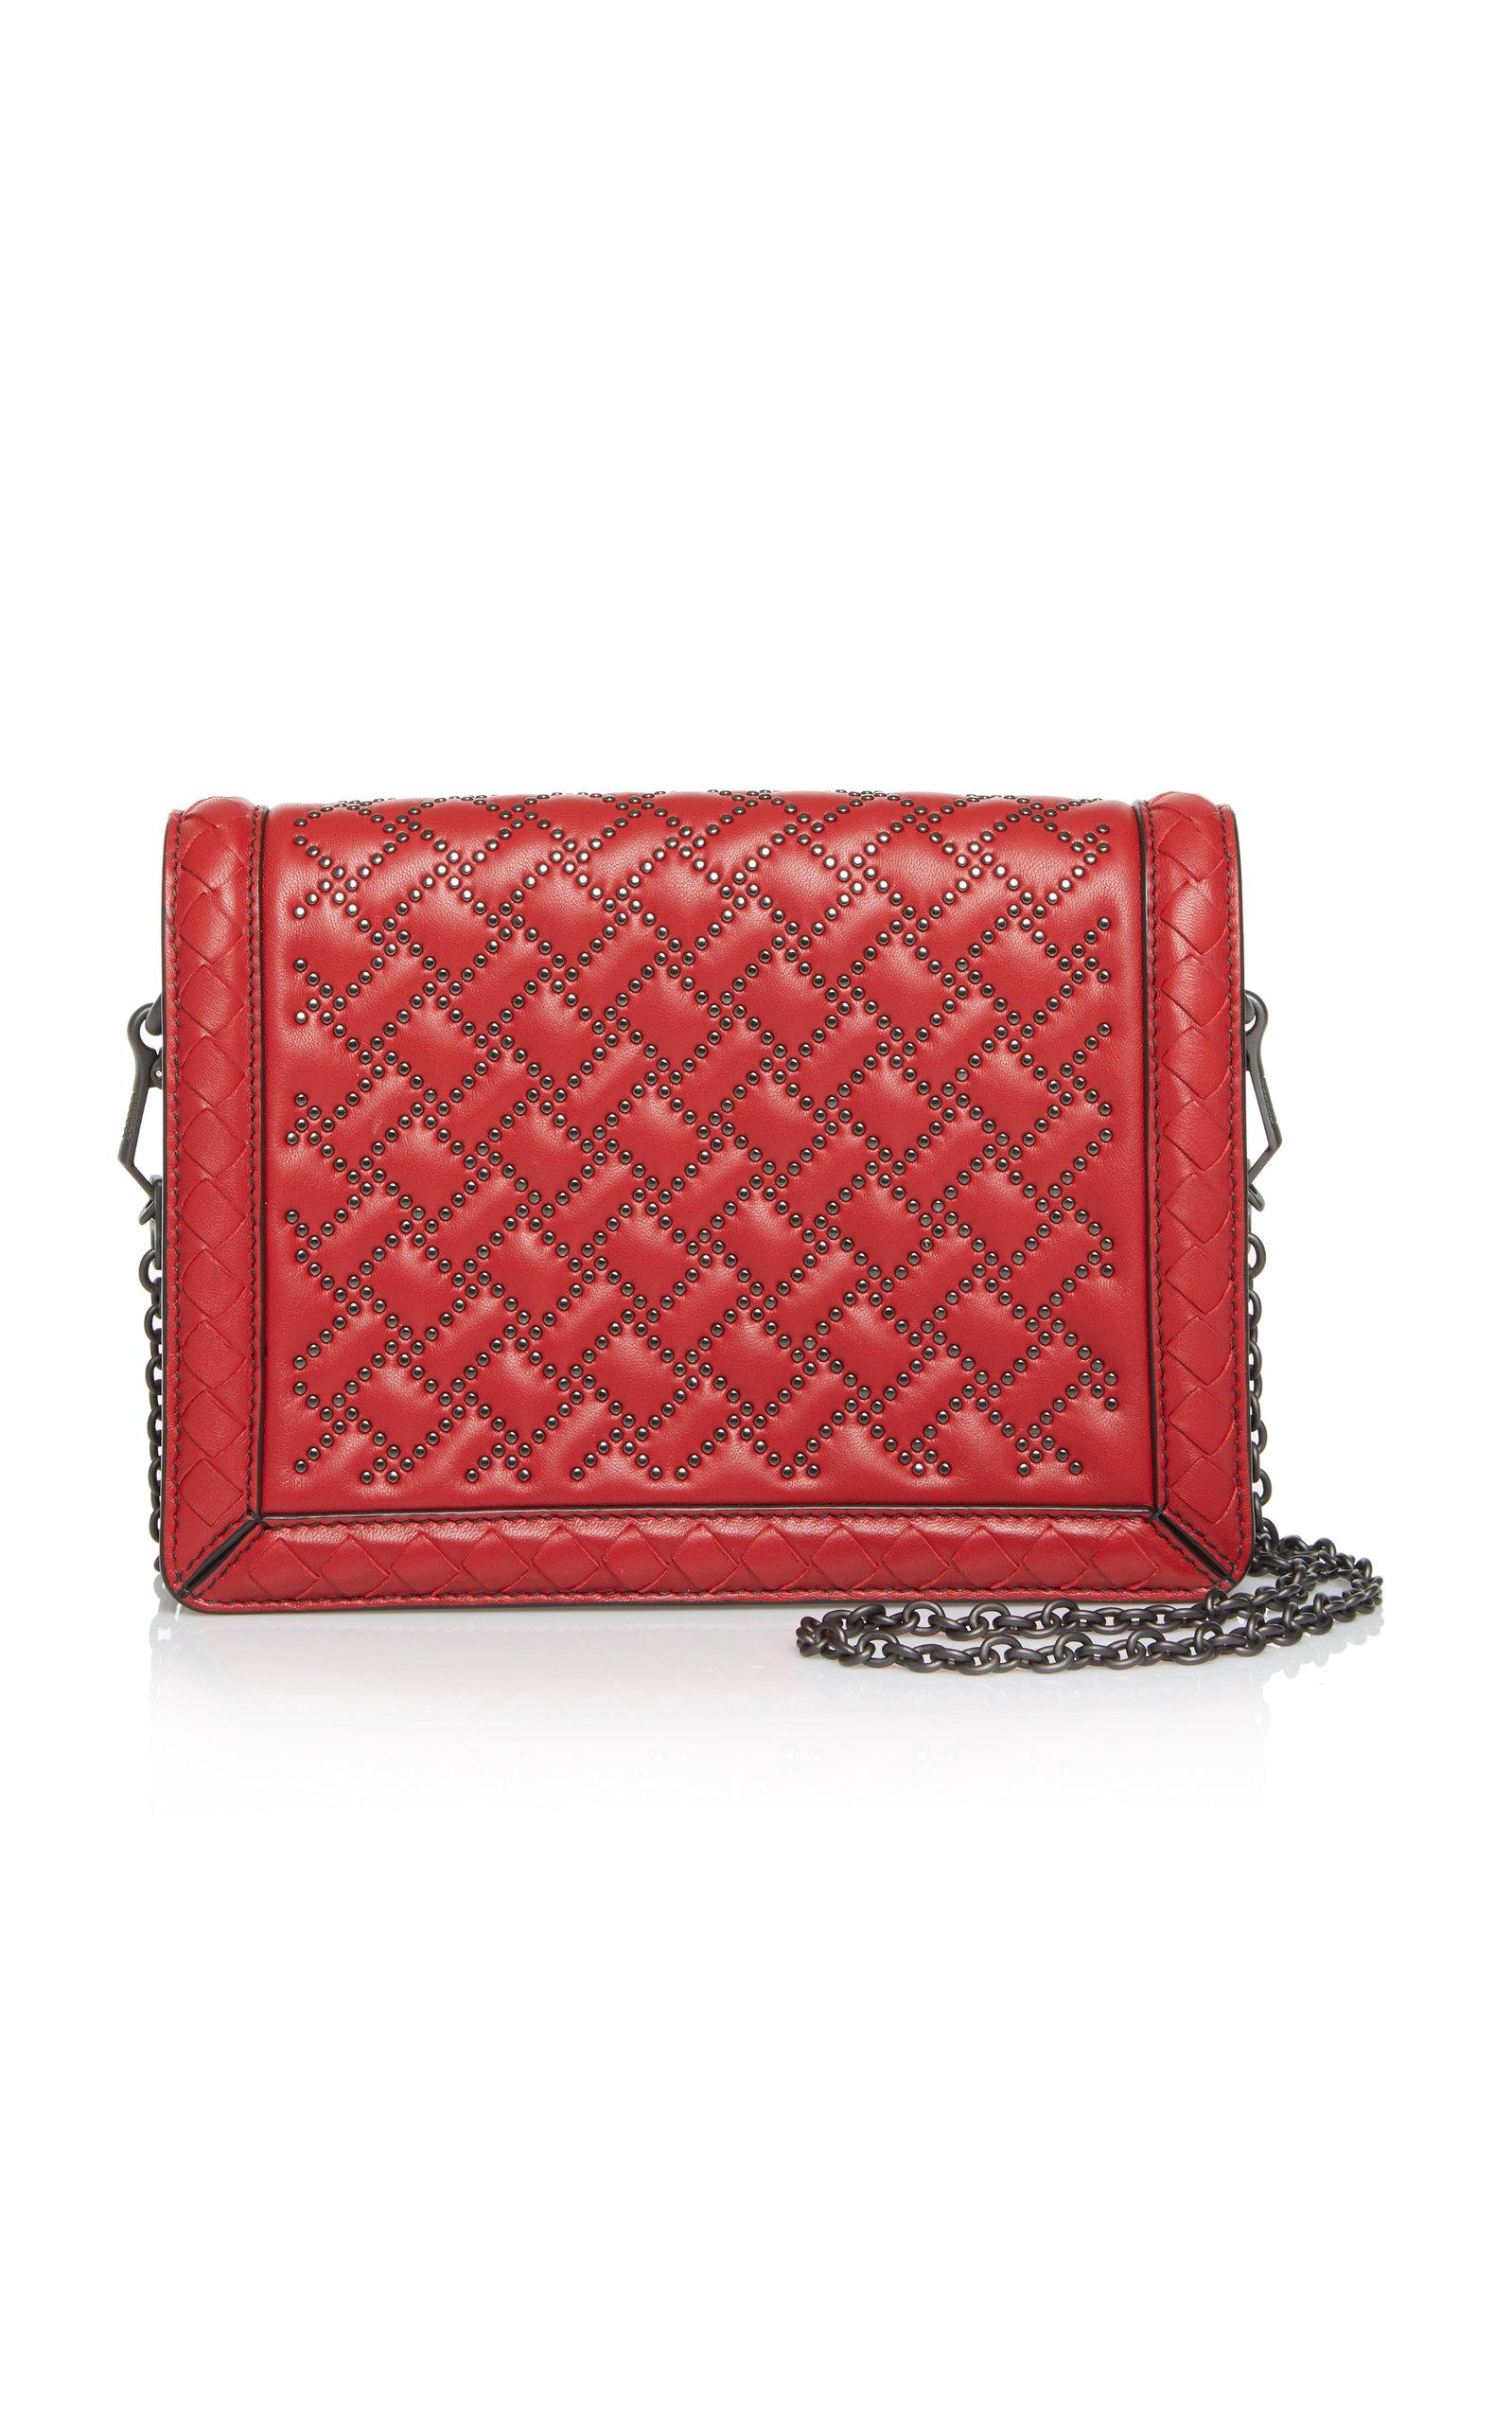 Bottega Veneta Mini Montebello Microstud Leather Shoulder Bag nnUgRAk7Z4